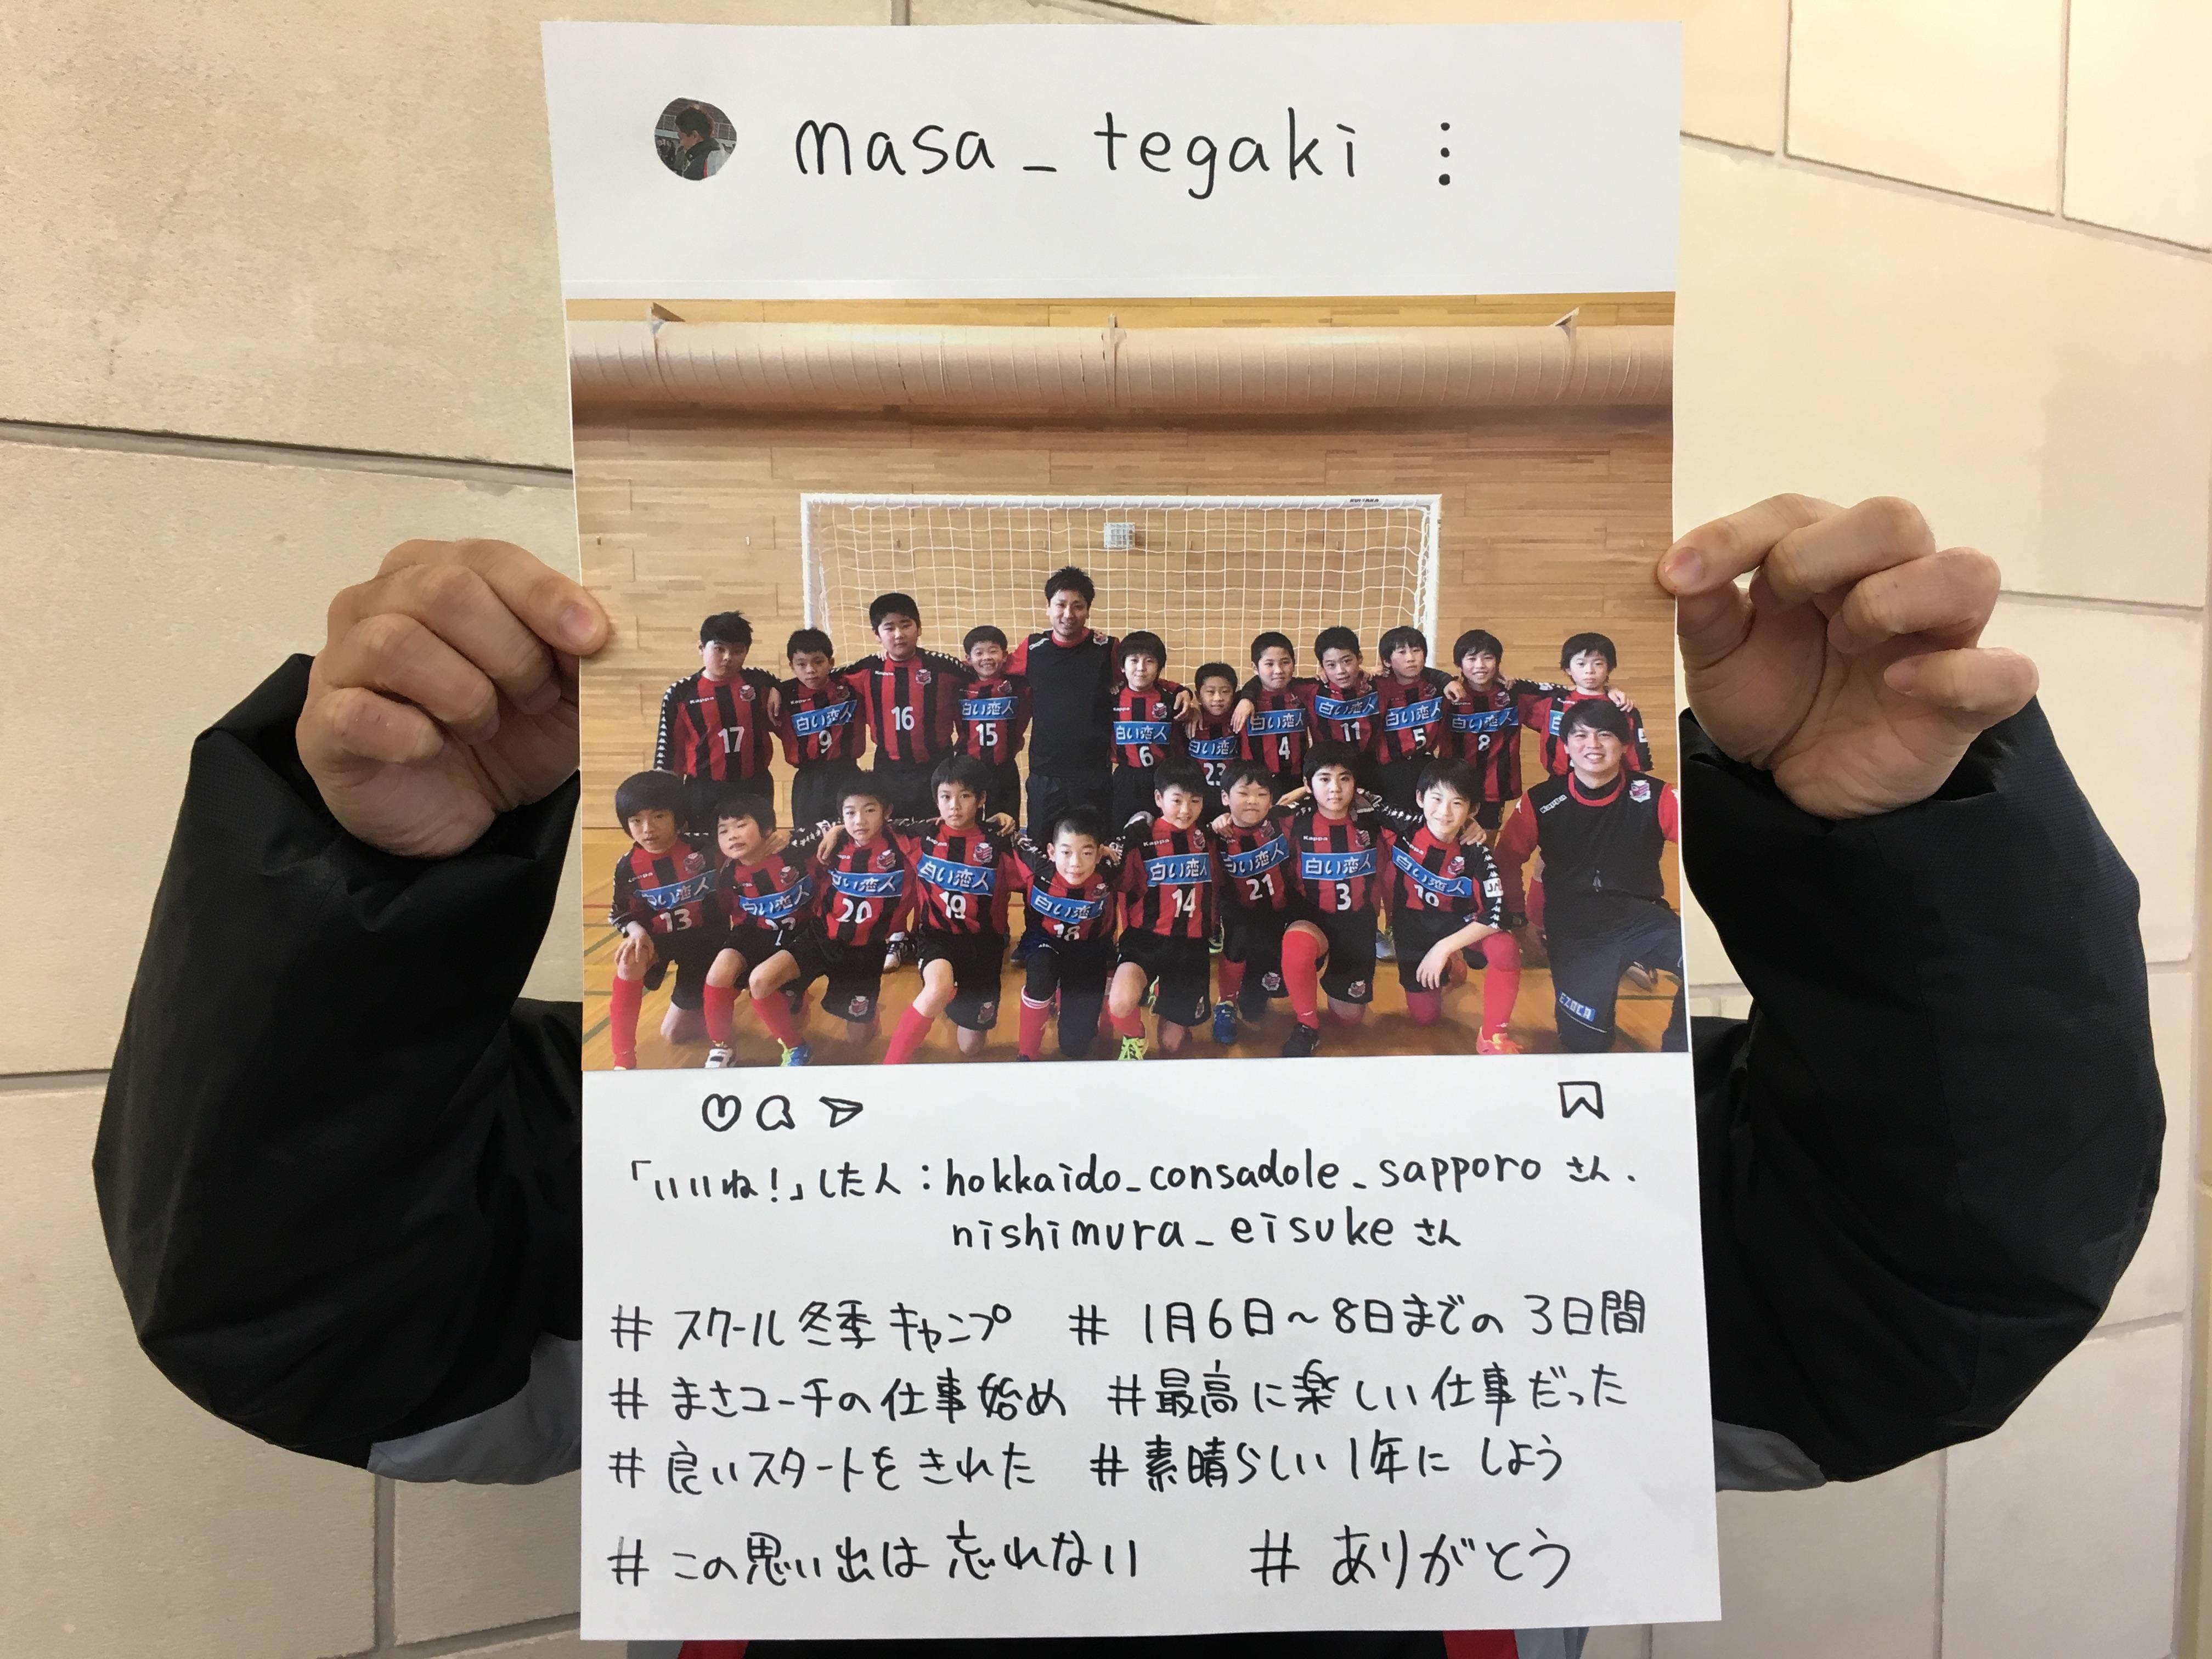 http://chsc.jp/report/up_images/E6706400-8E86-416F-B0A0-576C4613EF46.jpeg